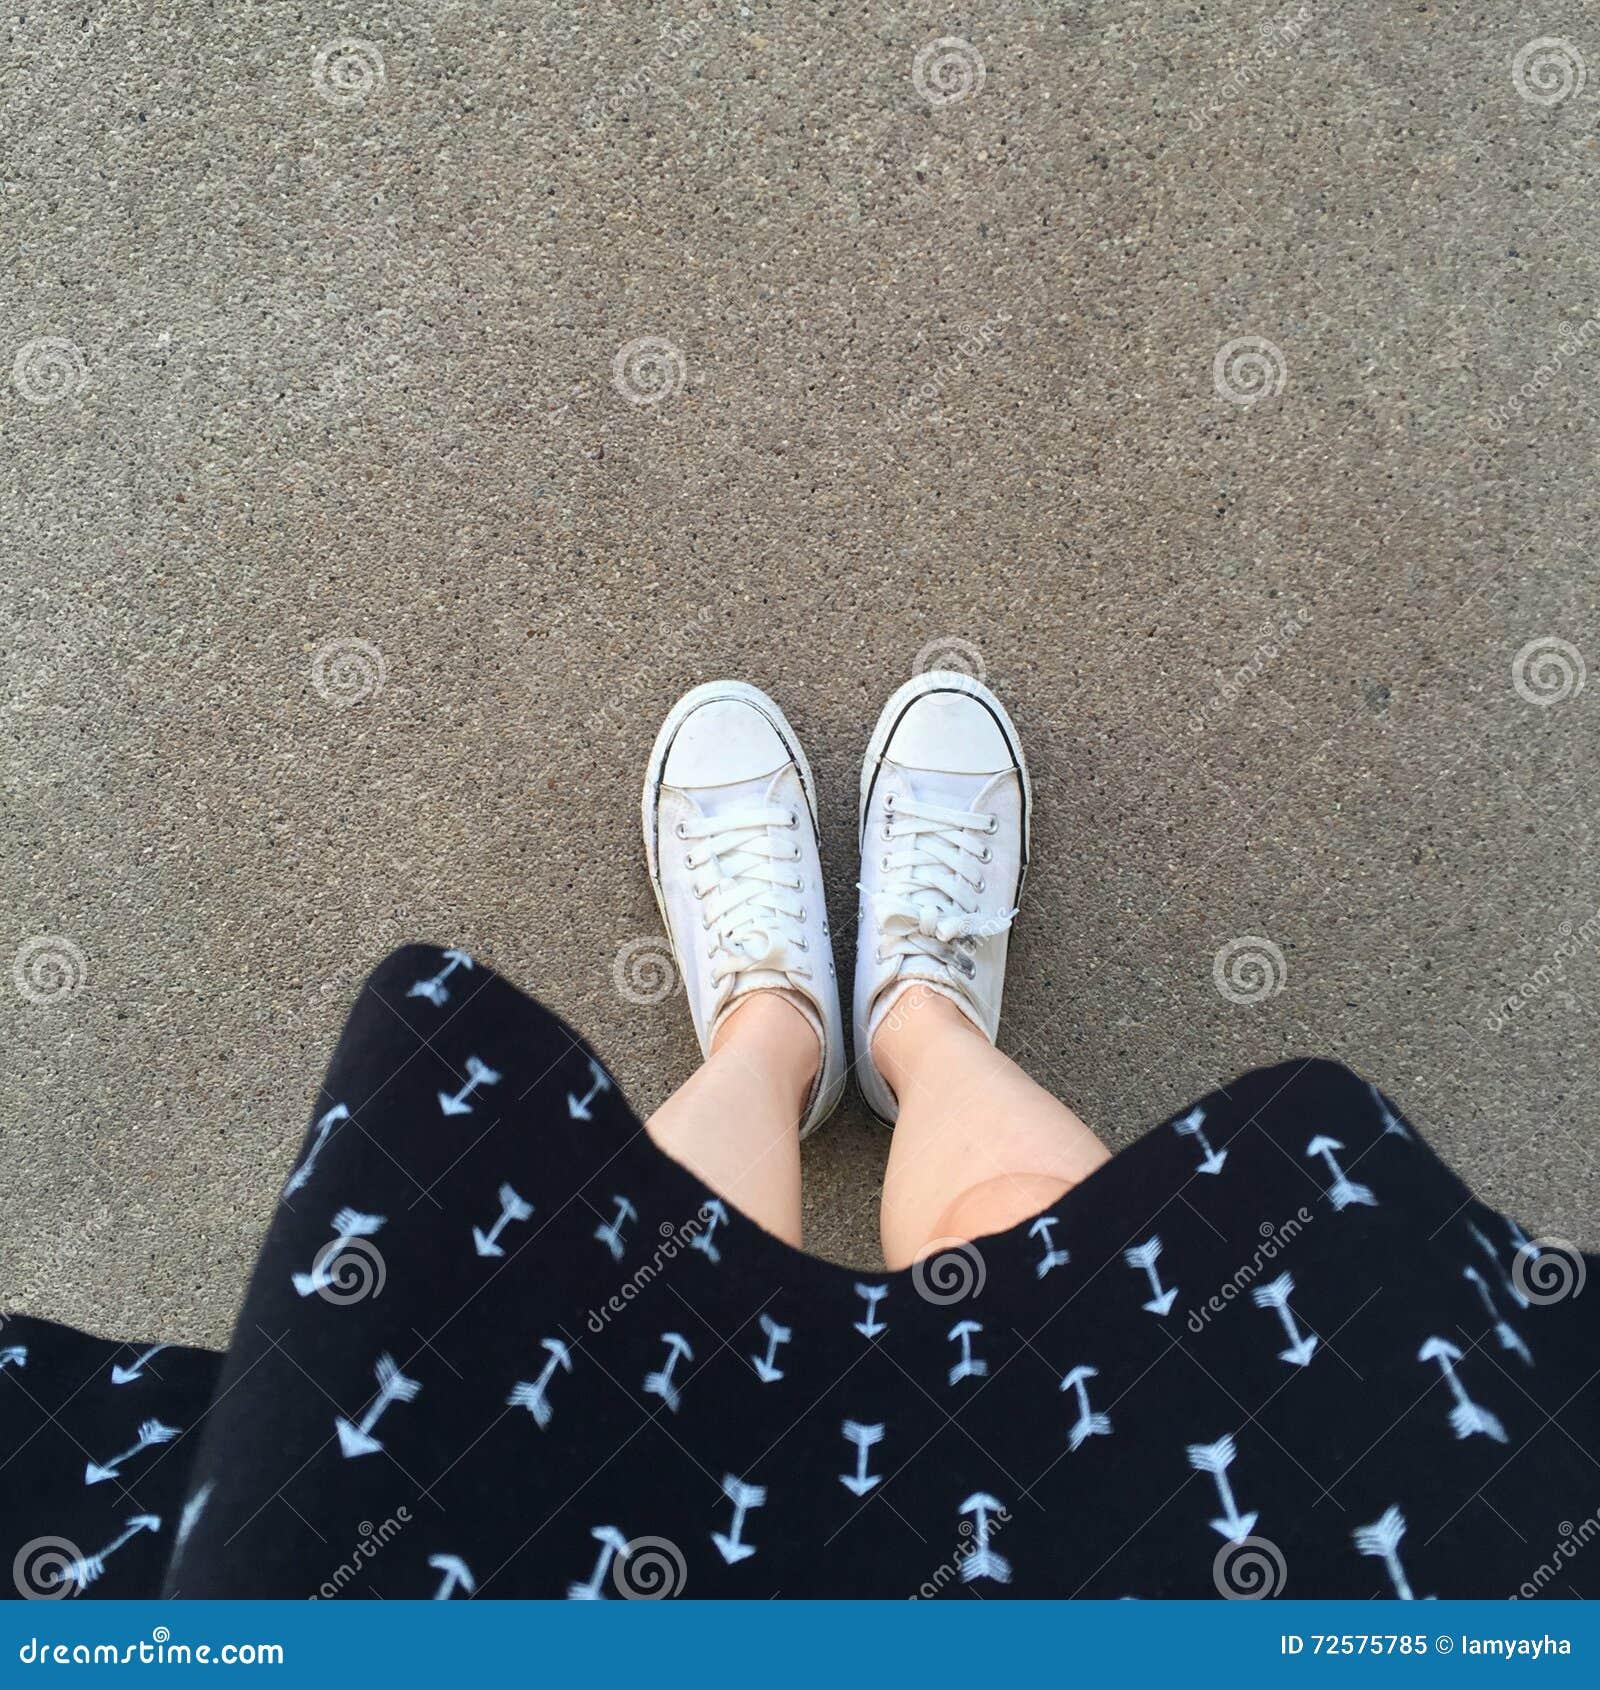 Women s white gumshoes. White dress. Warm season style for women. Practical fabric shoes